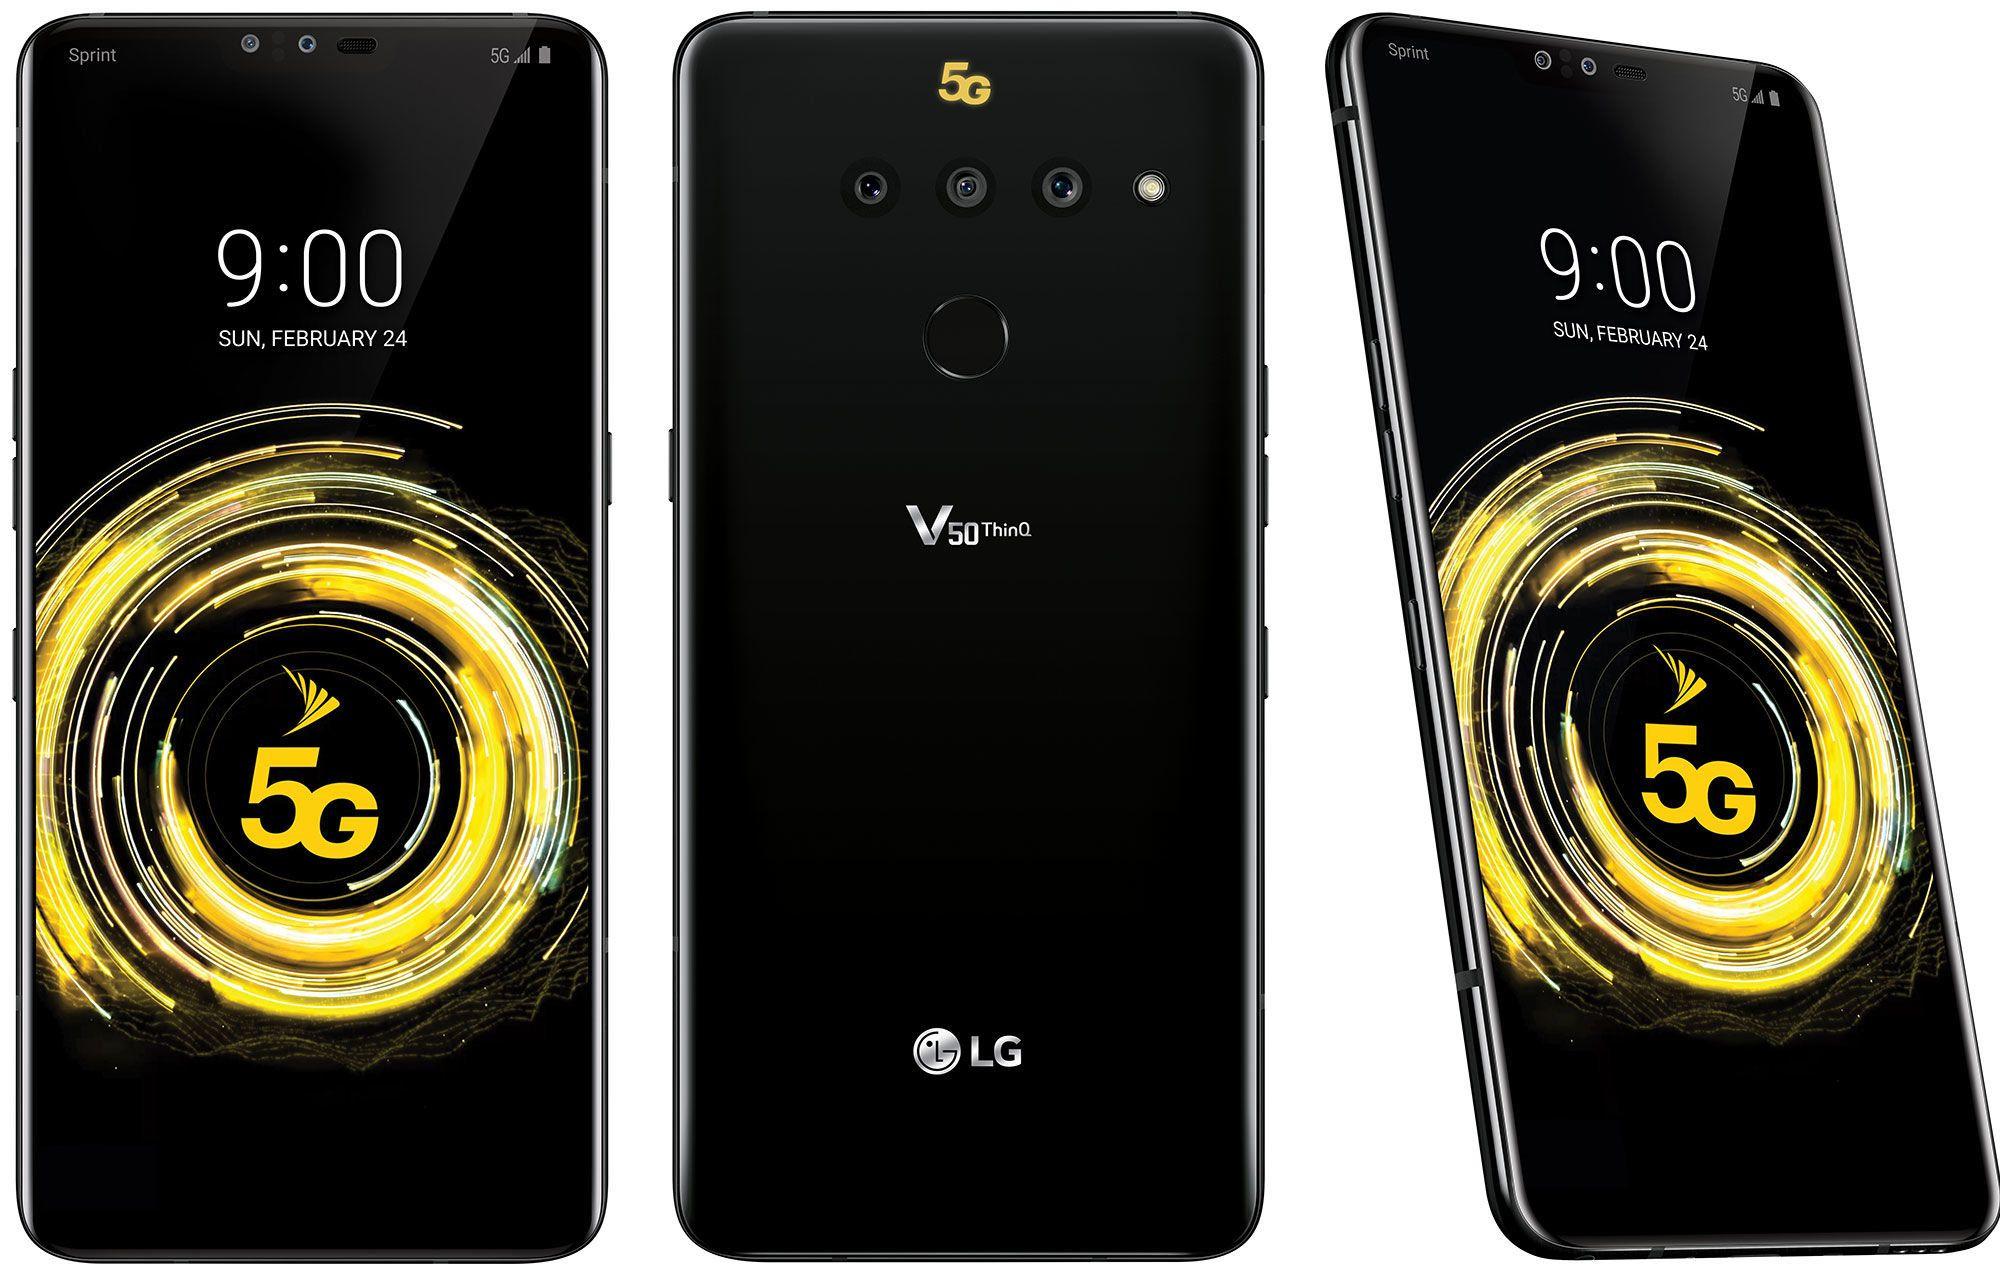 Смартфон LG V50 ThinQ 5G — достоинства и недостатки